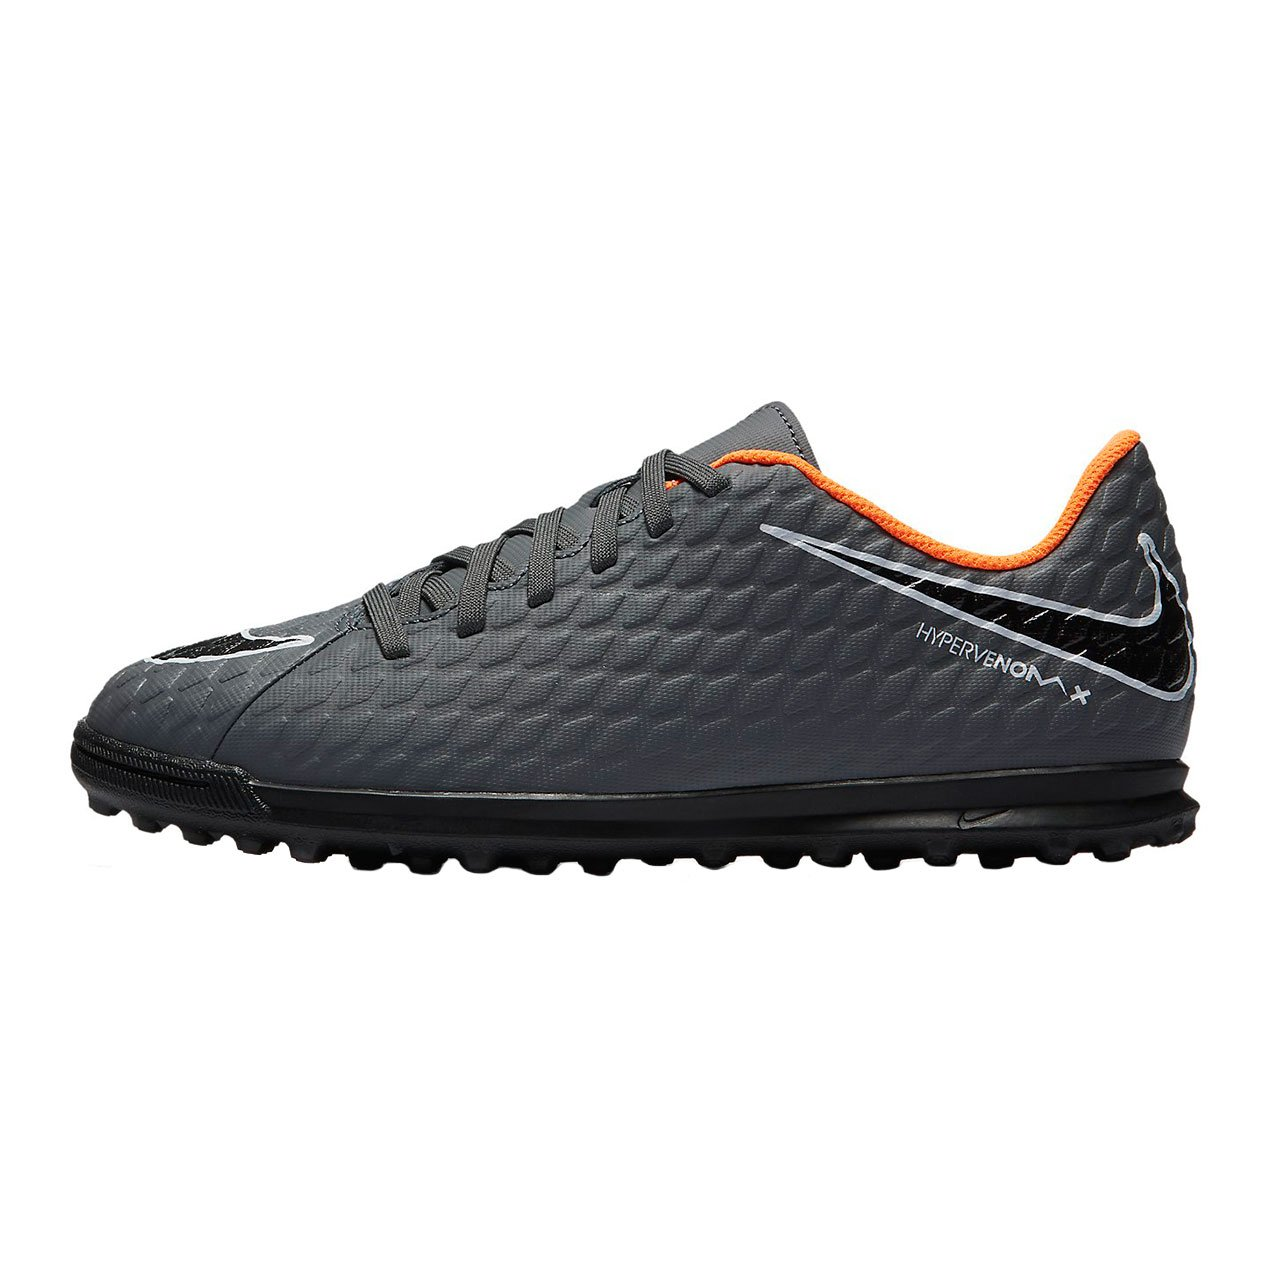 promo code c2feb d64b6 Nike Jr Phantomx 3 Club Tf, Scarpe da Fitness Unisex - Bambini: Amazon.it:  Scarpe e borse